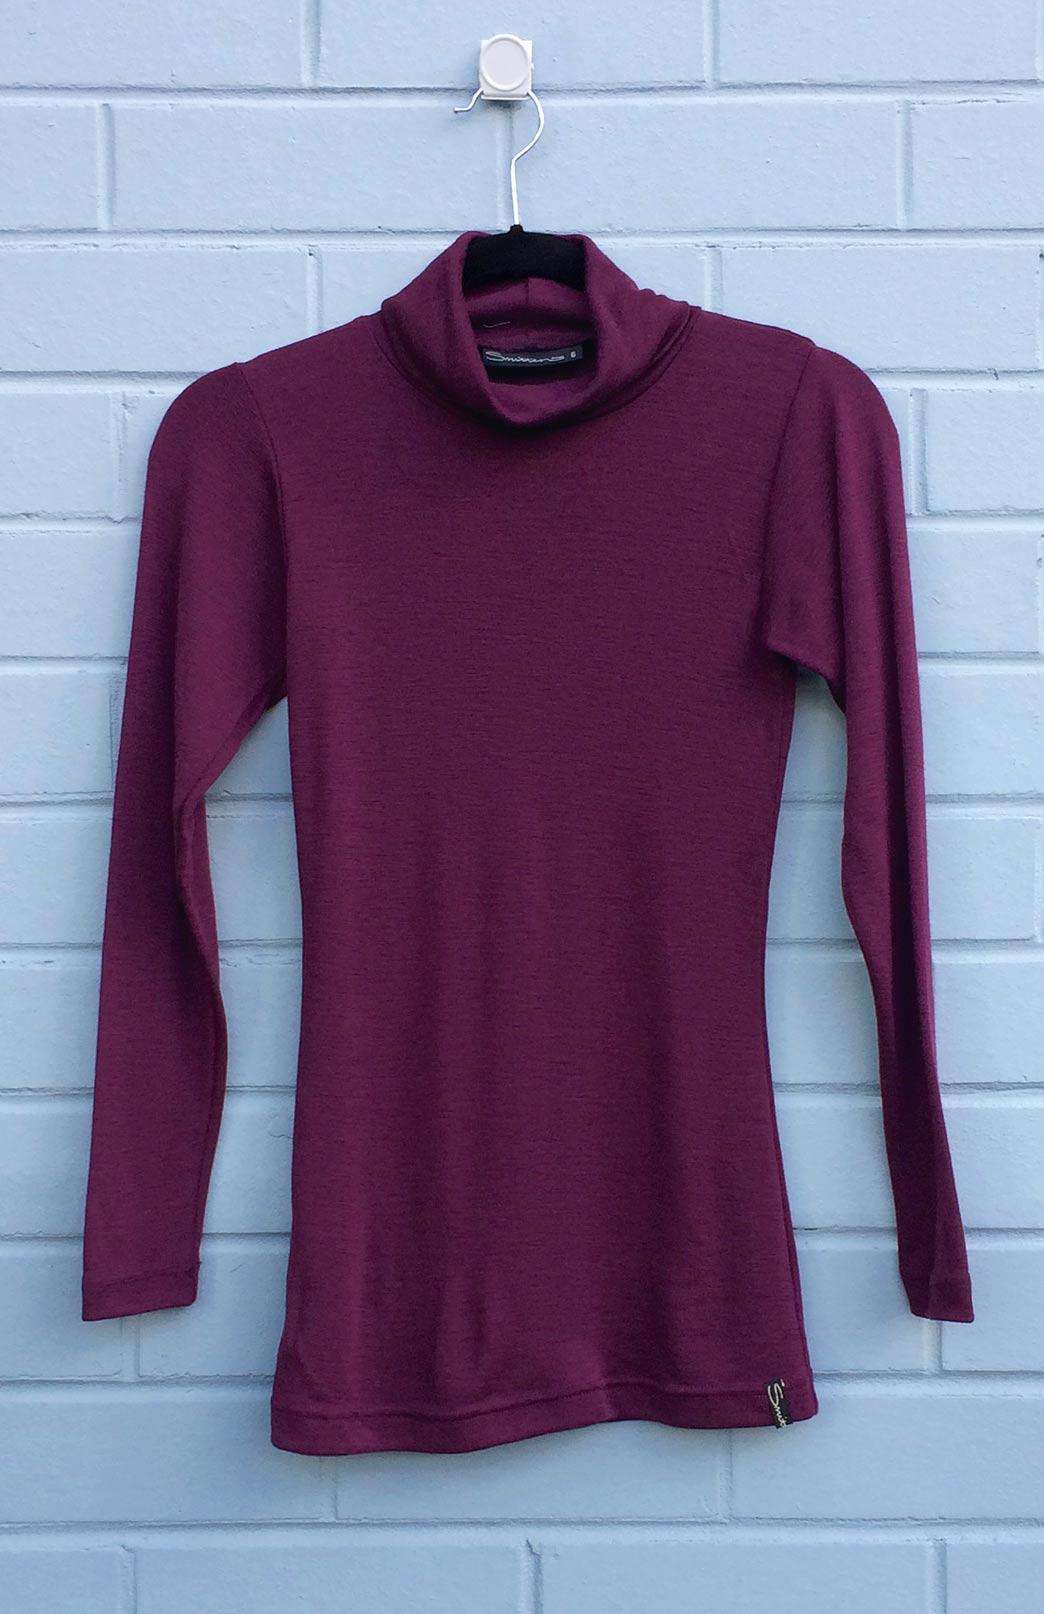 Polo Neck Top - Women's Aubergine Purple Pure Wool Polo Neck Top with Long Sleeves - Smitten Merino Tasmania Australia